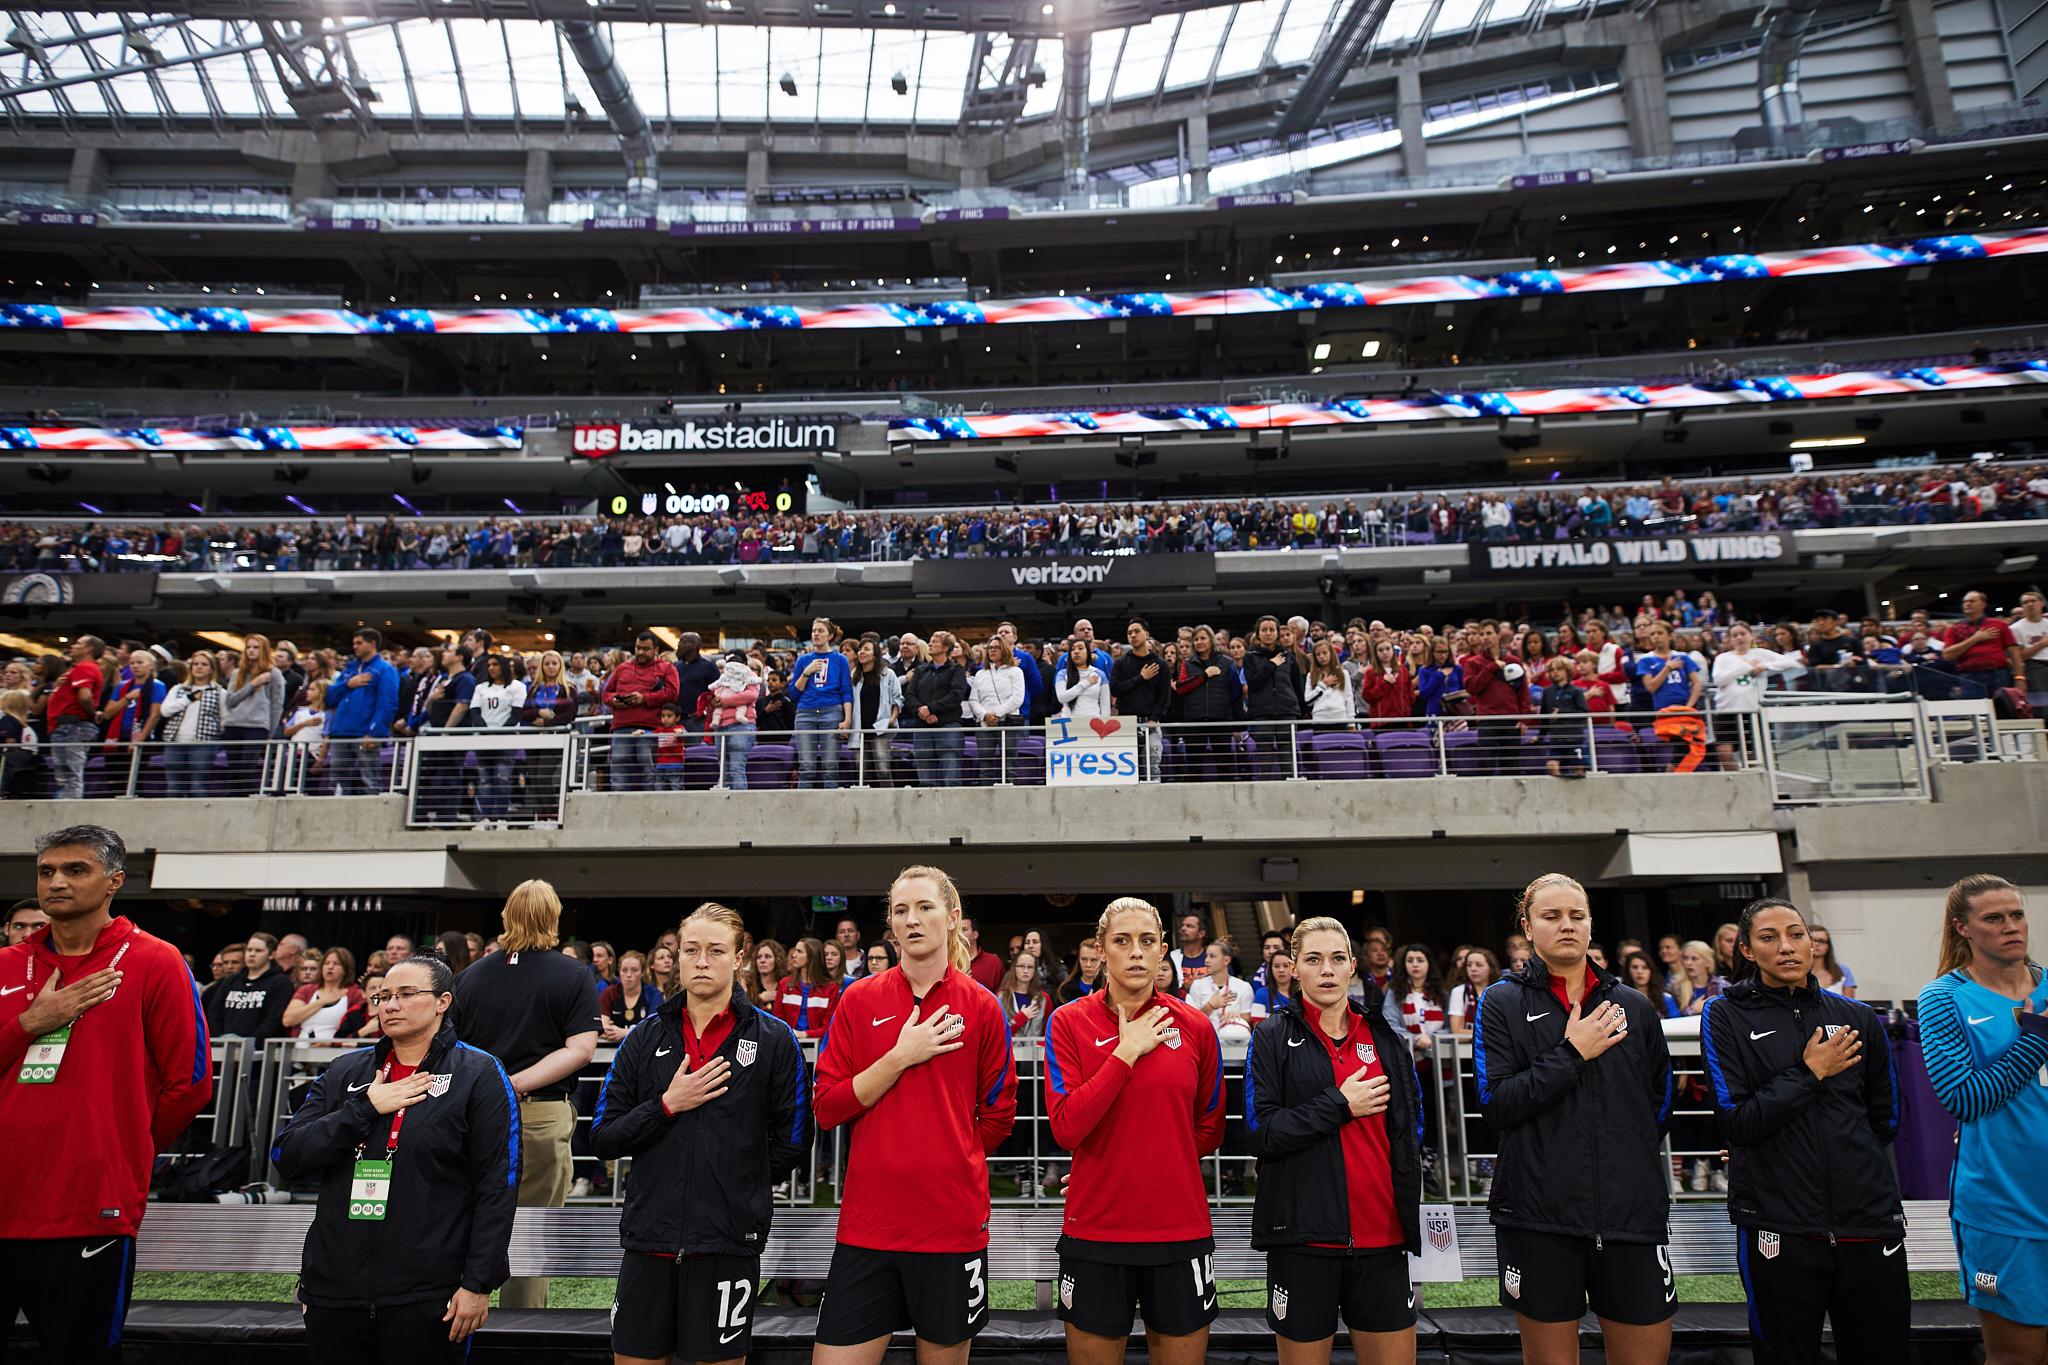 US_Womens_National_Team_Vs_Switzerland_at_US_Bank_Stadium_10-23-2016_Photo_By_Joe_Lemke_013.jpg